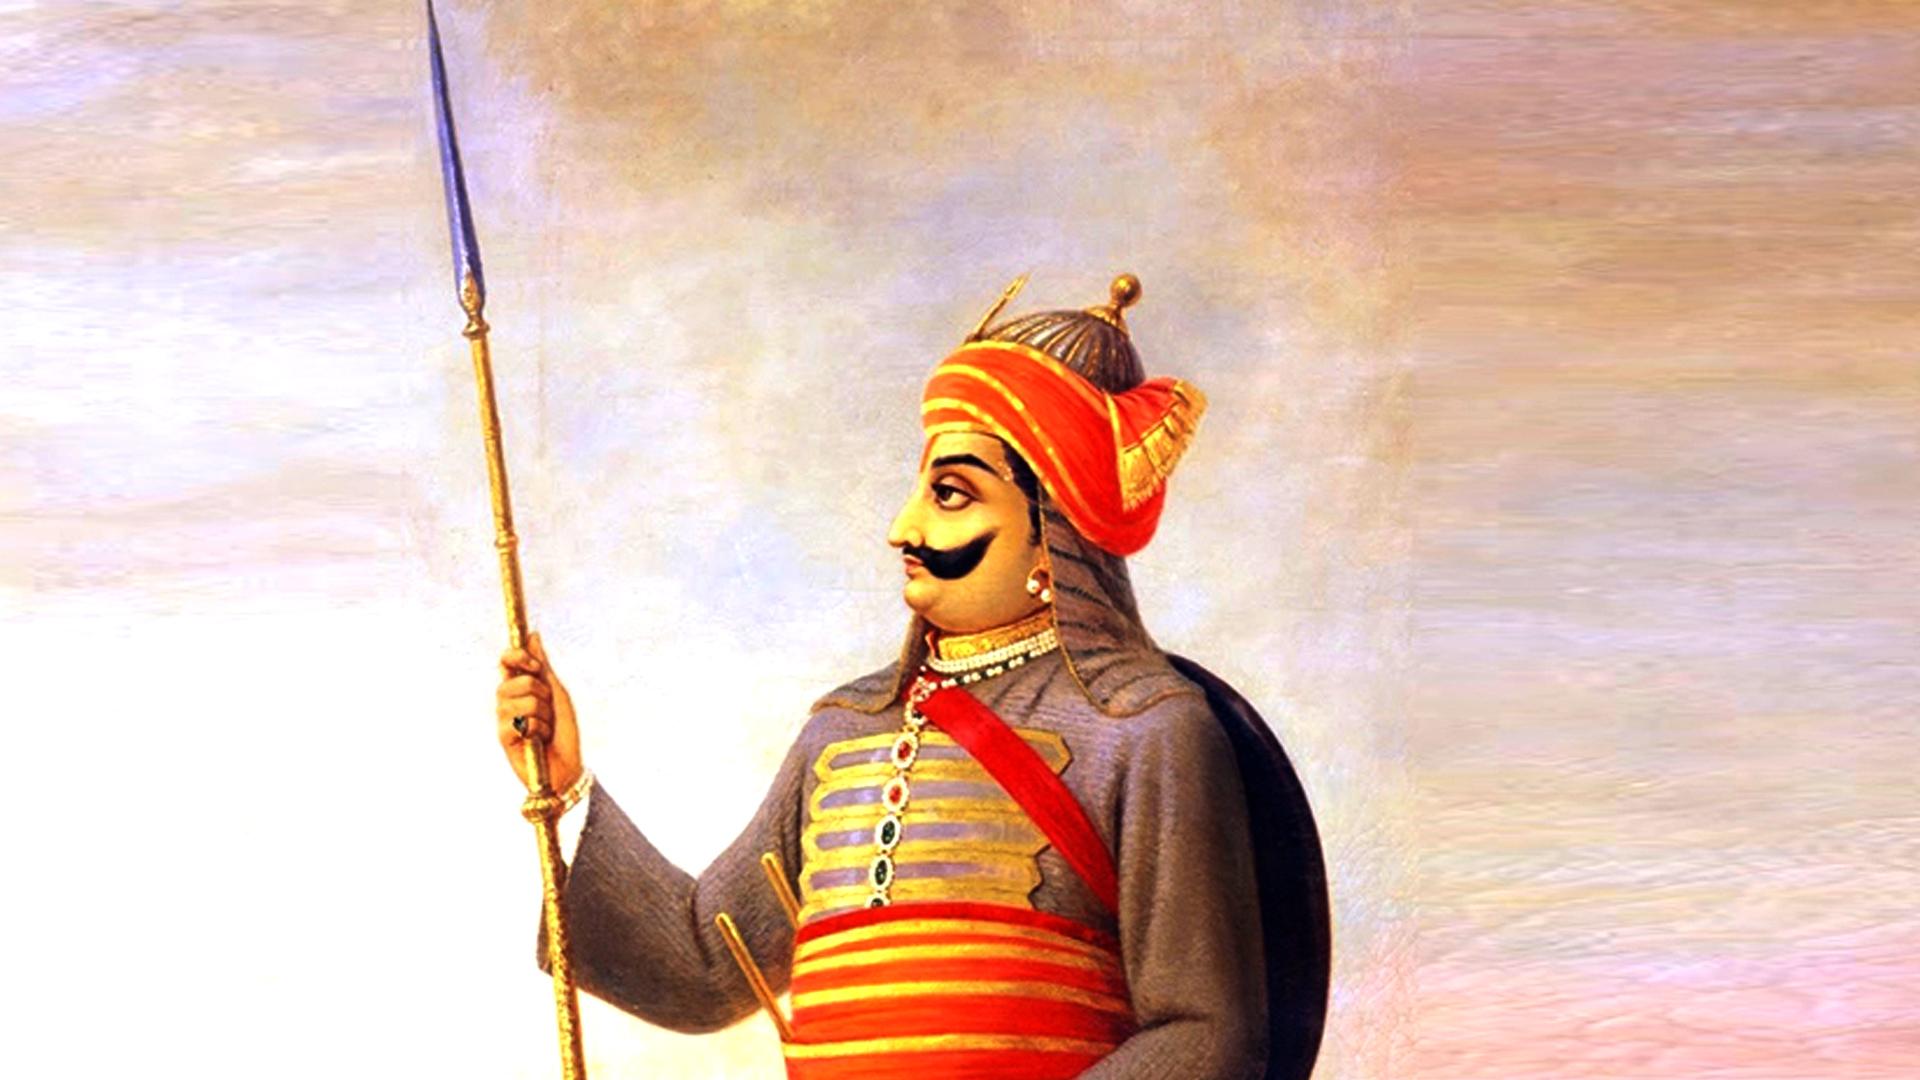 Maharana Pratap hd wallpaper (45 Wallpapers) – Adorable ...